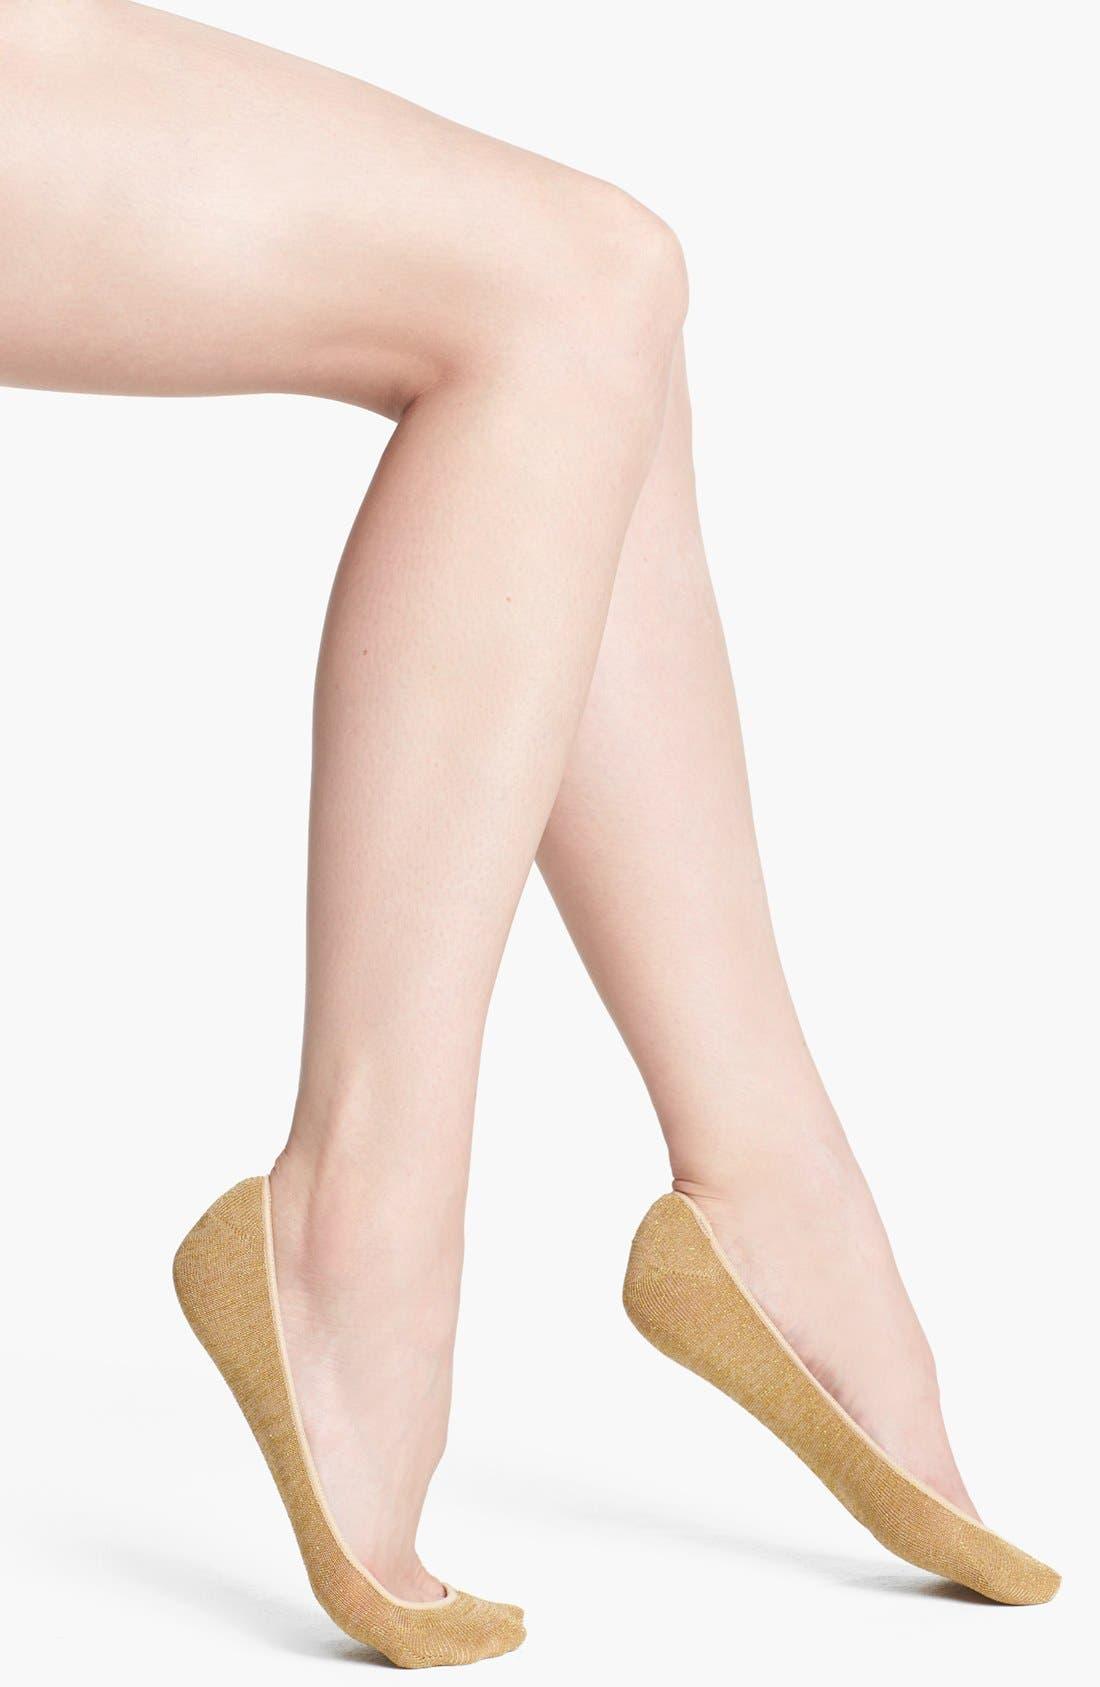 Alternate Image 1 Selected - Hue 'Shine' Liner Socks